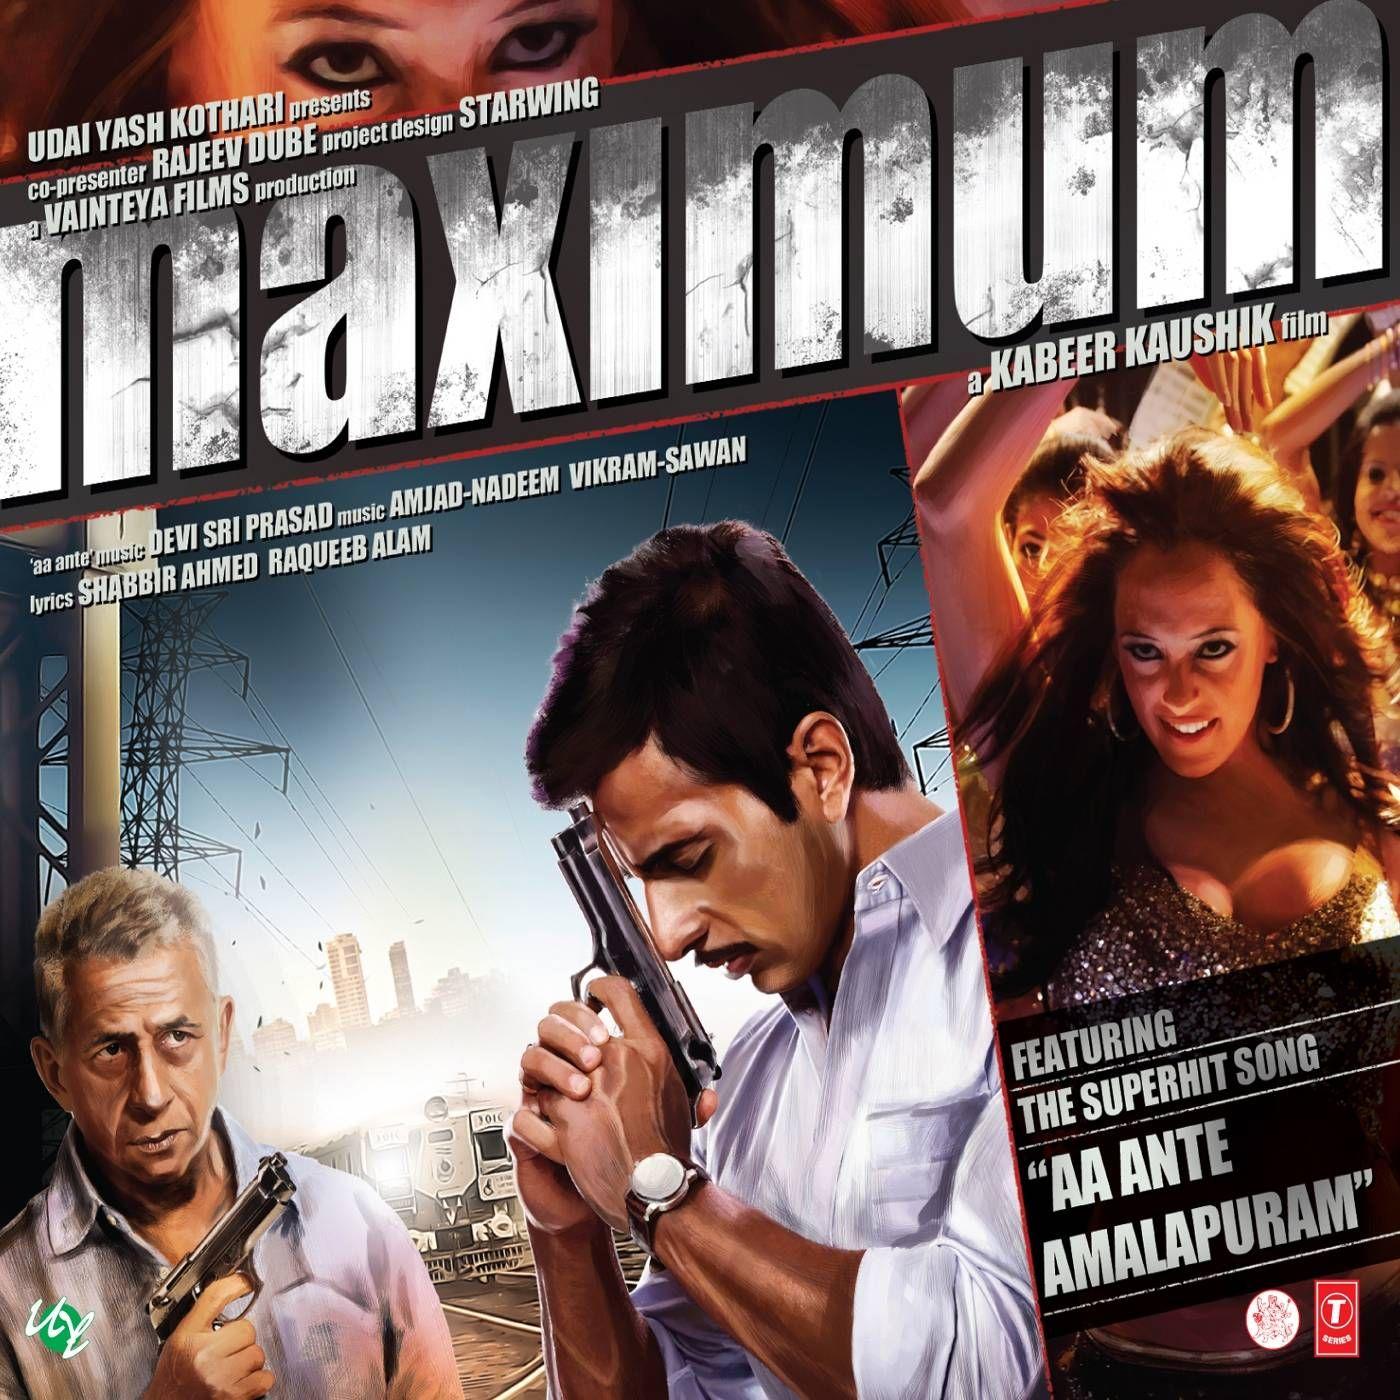 hindi movies review Mp3 song download, Mp3 song, Songs